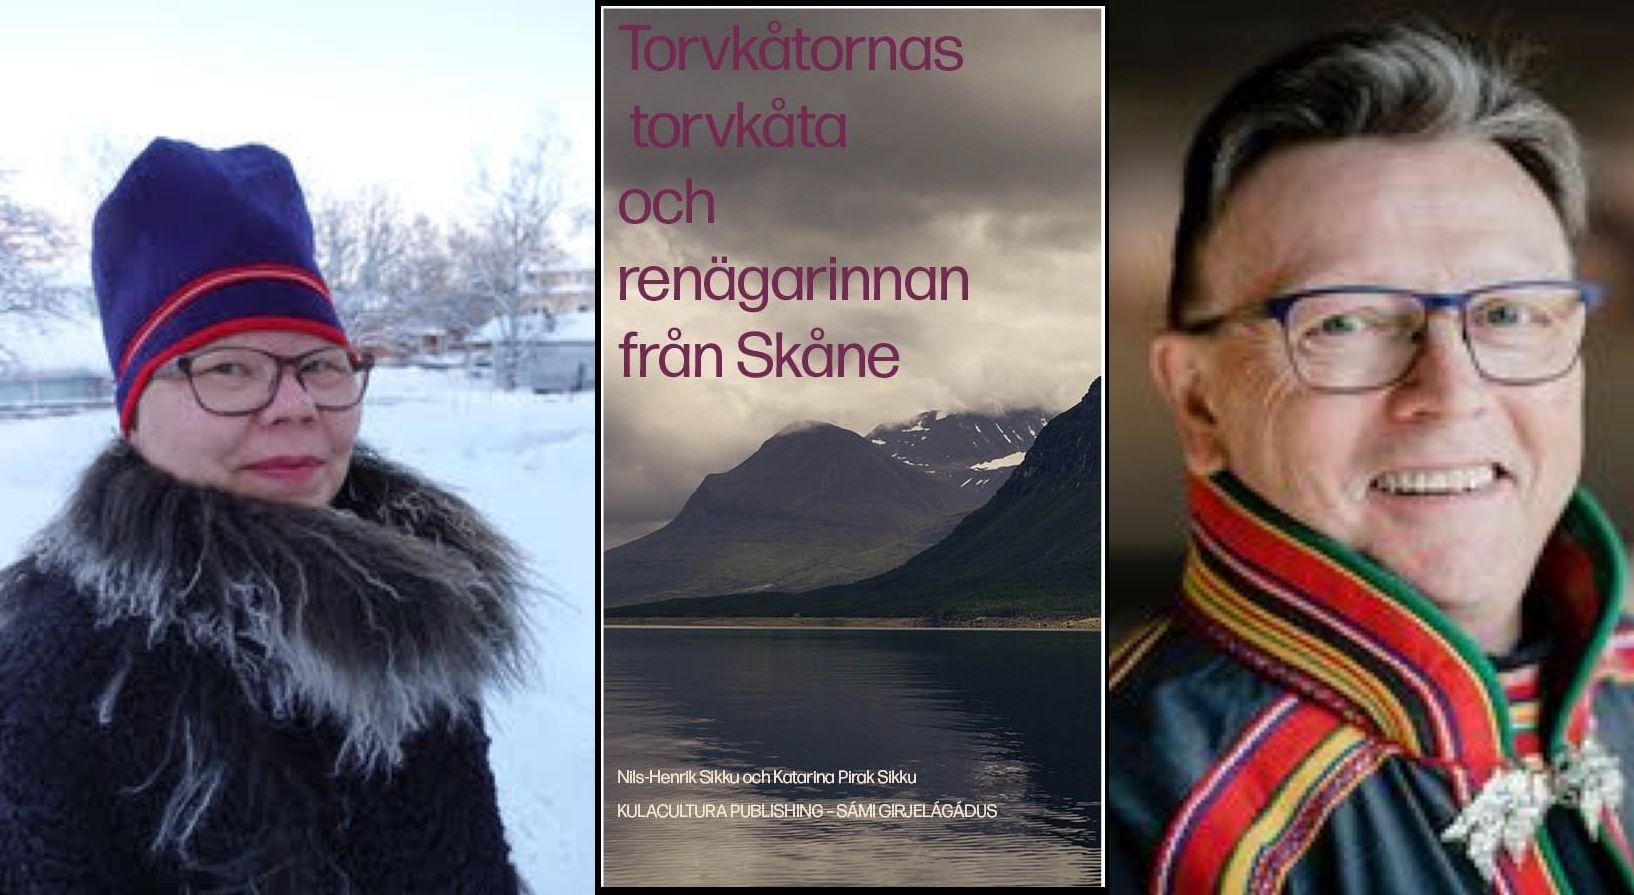 INSTÄLLT: Torvkåtornas torvkåta. Nils-Henrik Sikku och Katarina Pirak Sikku, 18 april